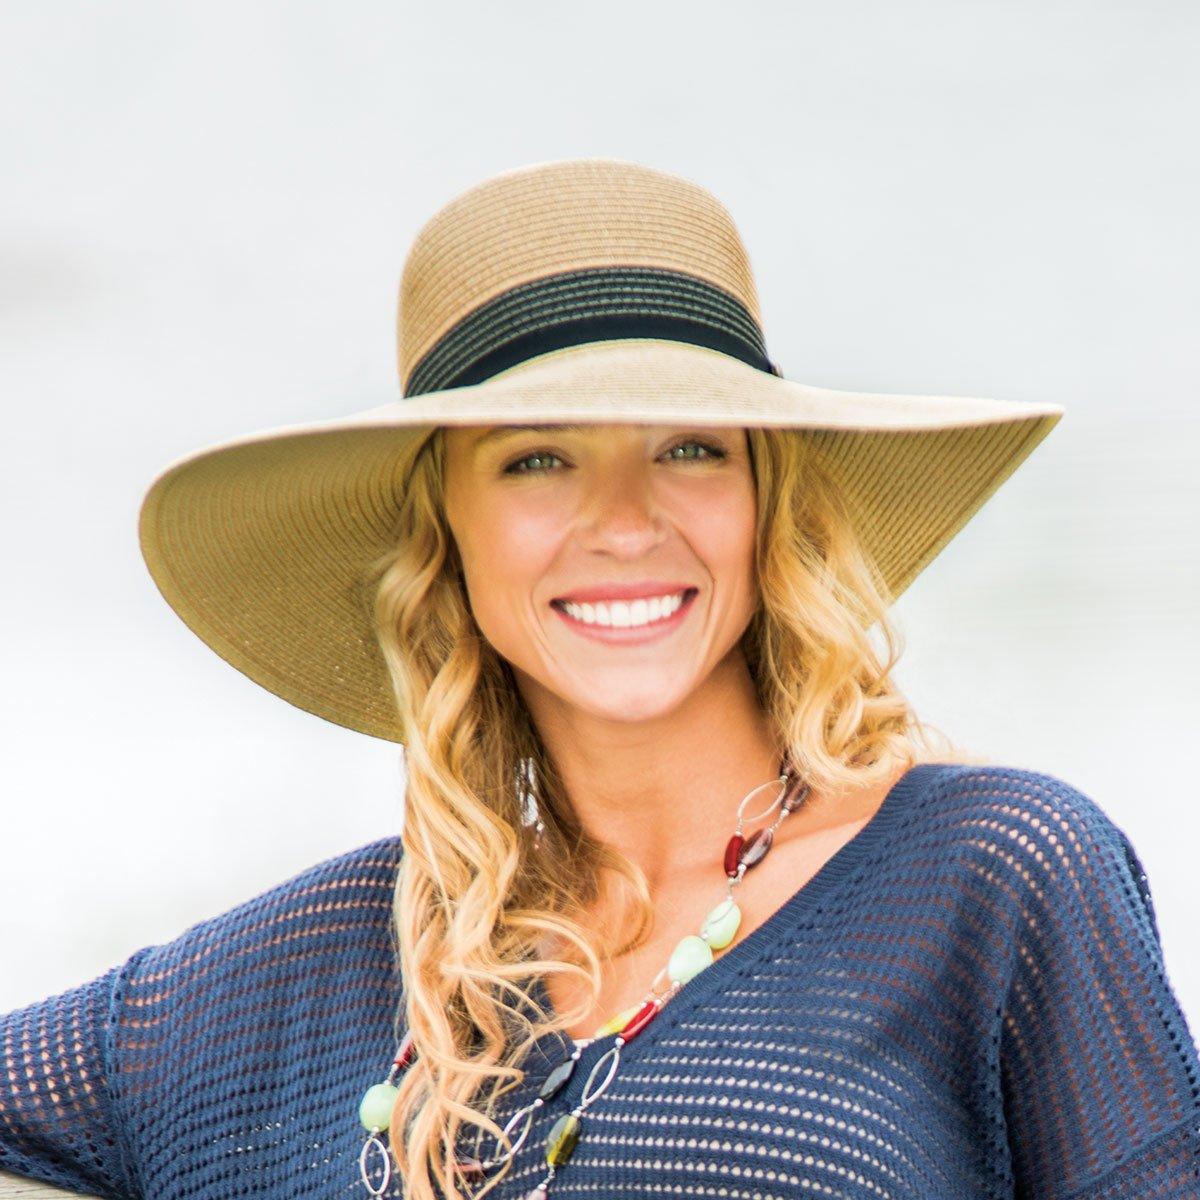 dffbf02cf91 Womens Wallaroo UV St Tropez Sun Hat - UPF50+ Sun Protection (Adjustable    Packable) (Natural Combo)  Amazon.co.uk  Clothing